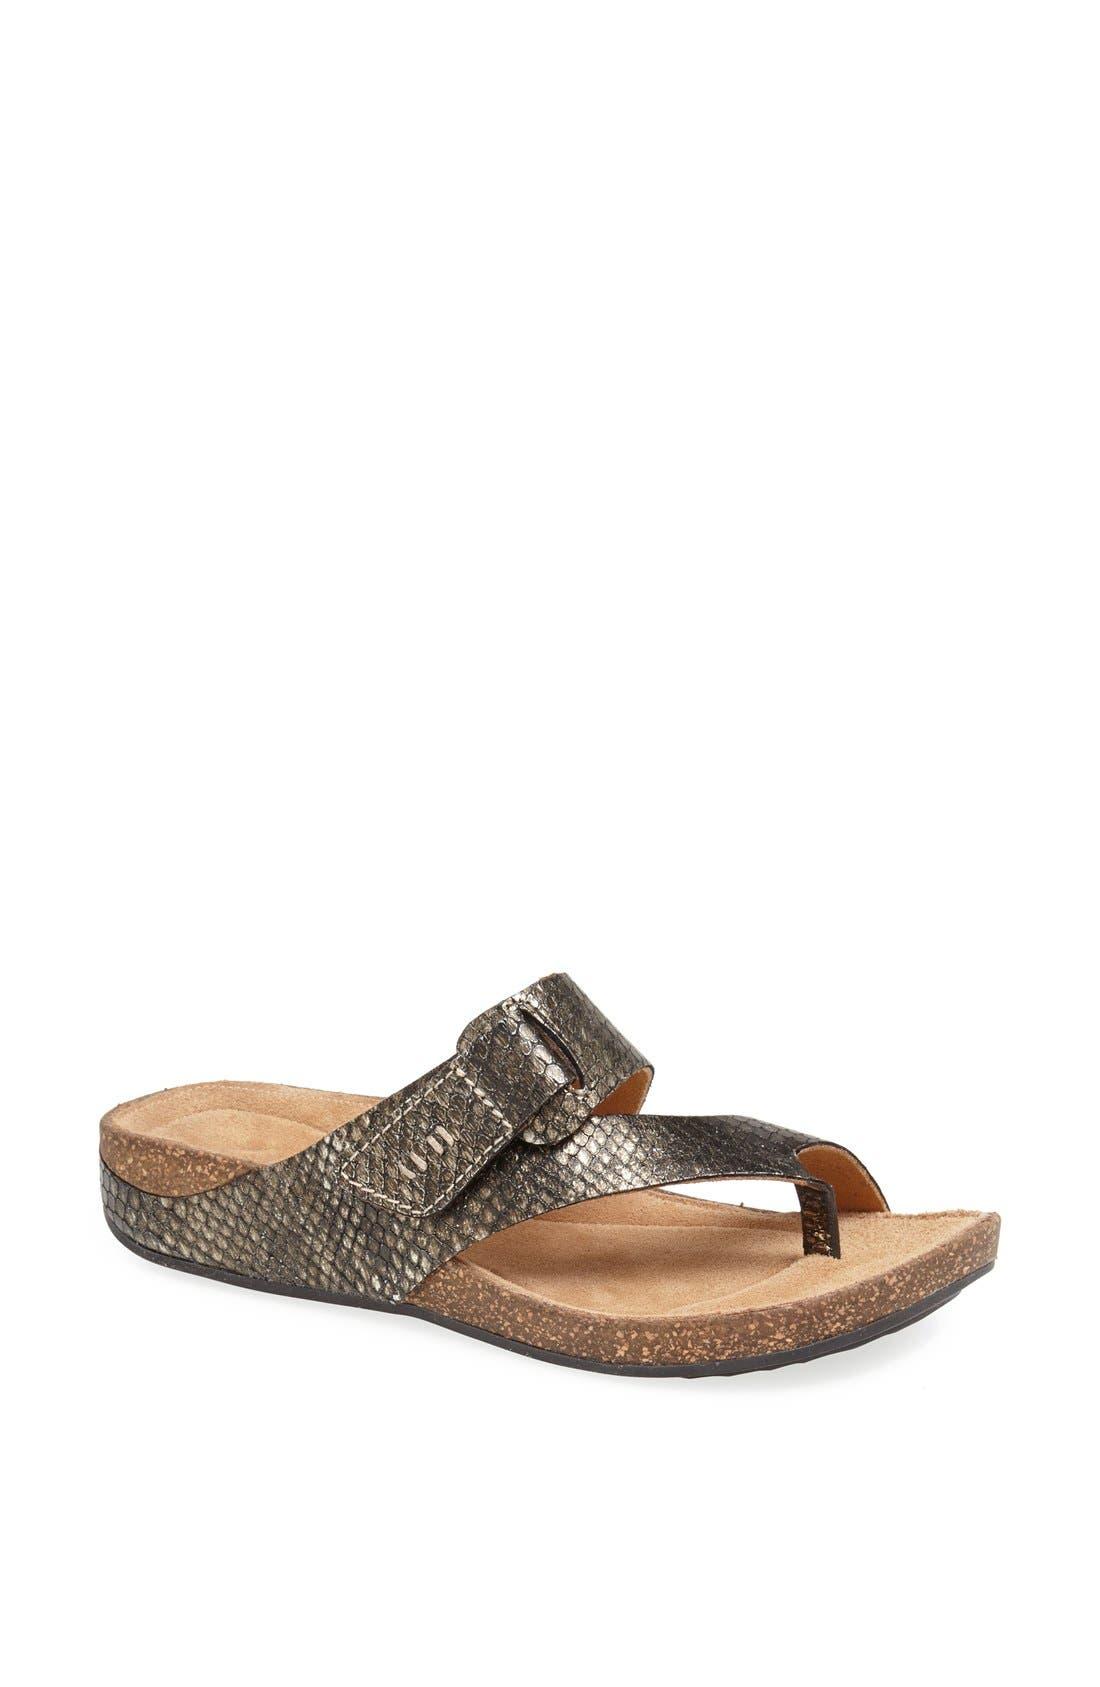 Main Image - Clarks® 'Perri Coast' Leather Thong Sandal